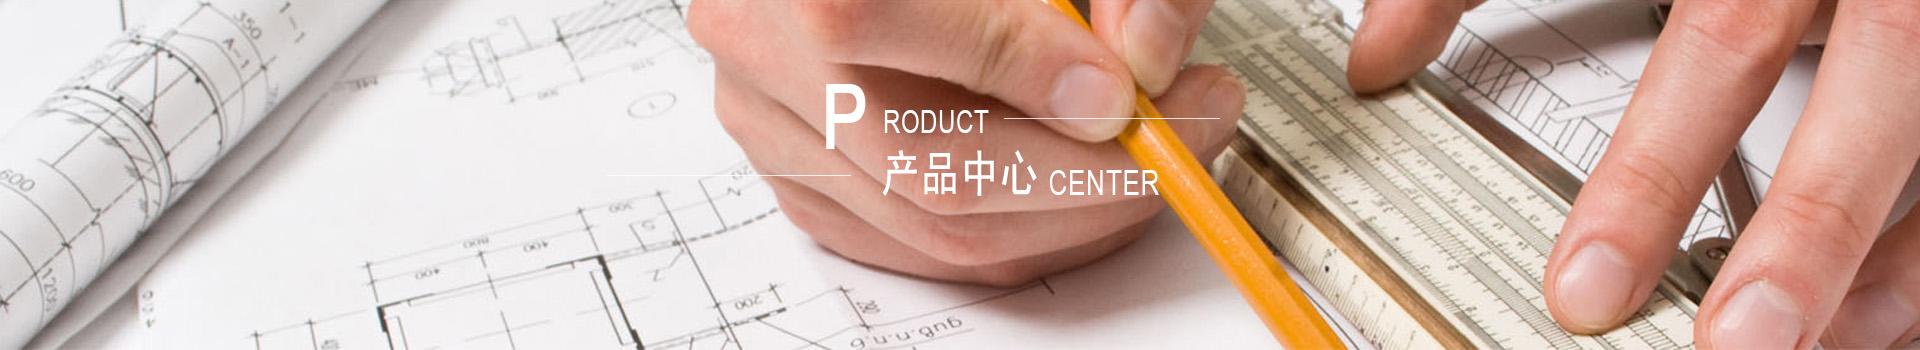 高频电yuan,